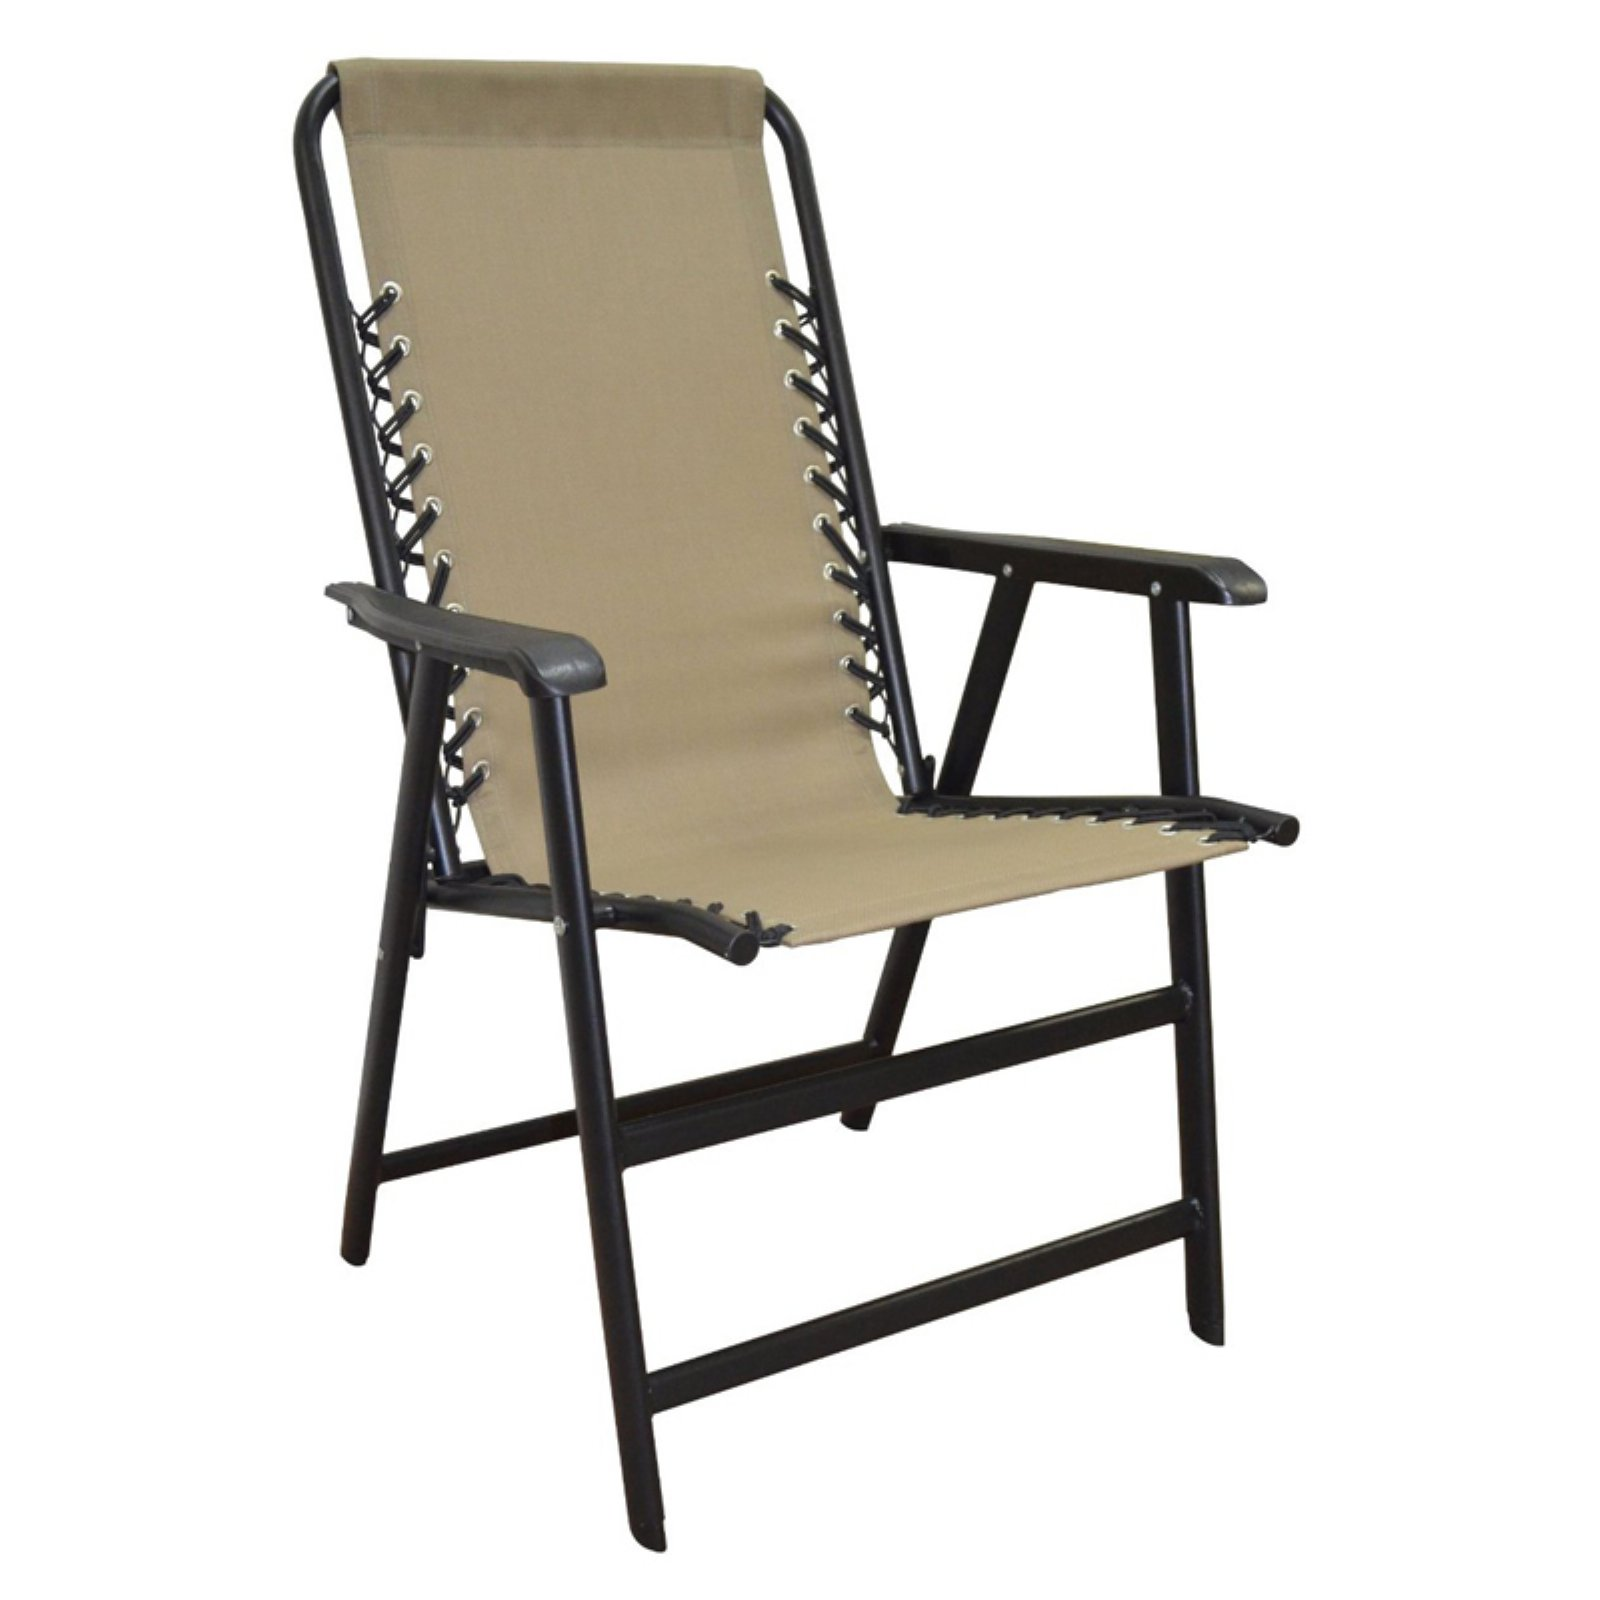 Caravan Global Sports Suspension Folding Chair Walmart